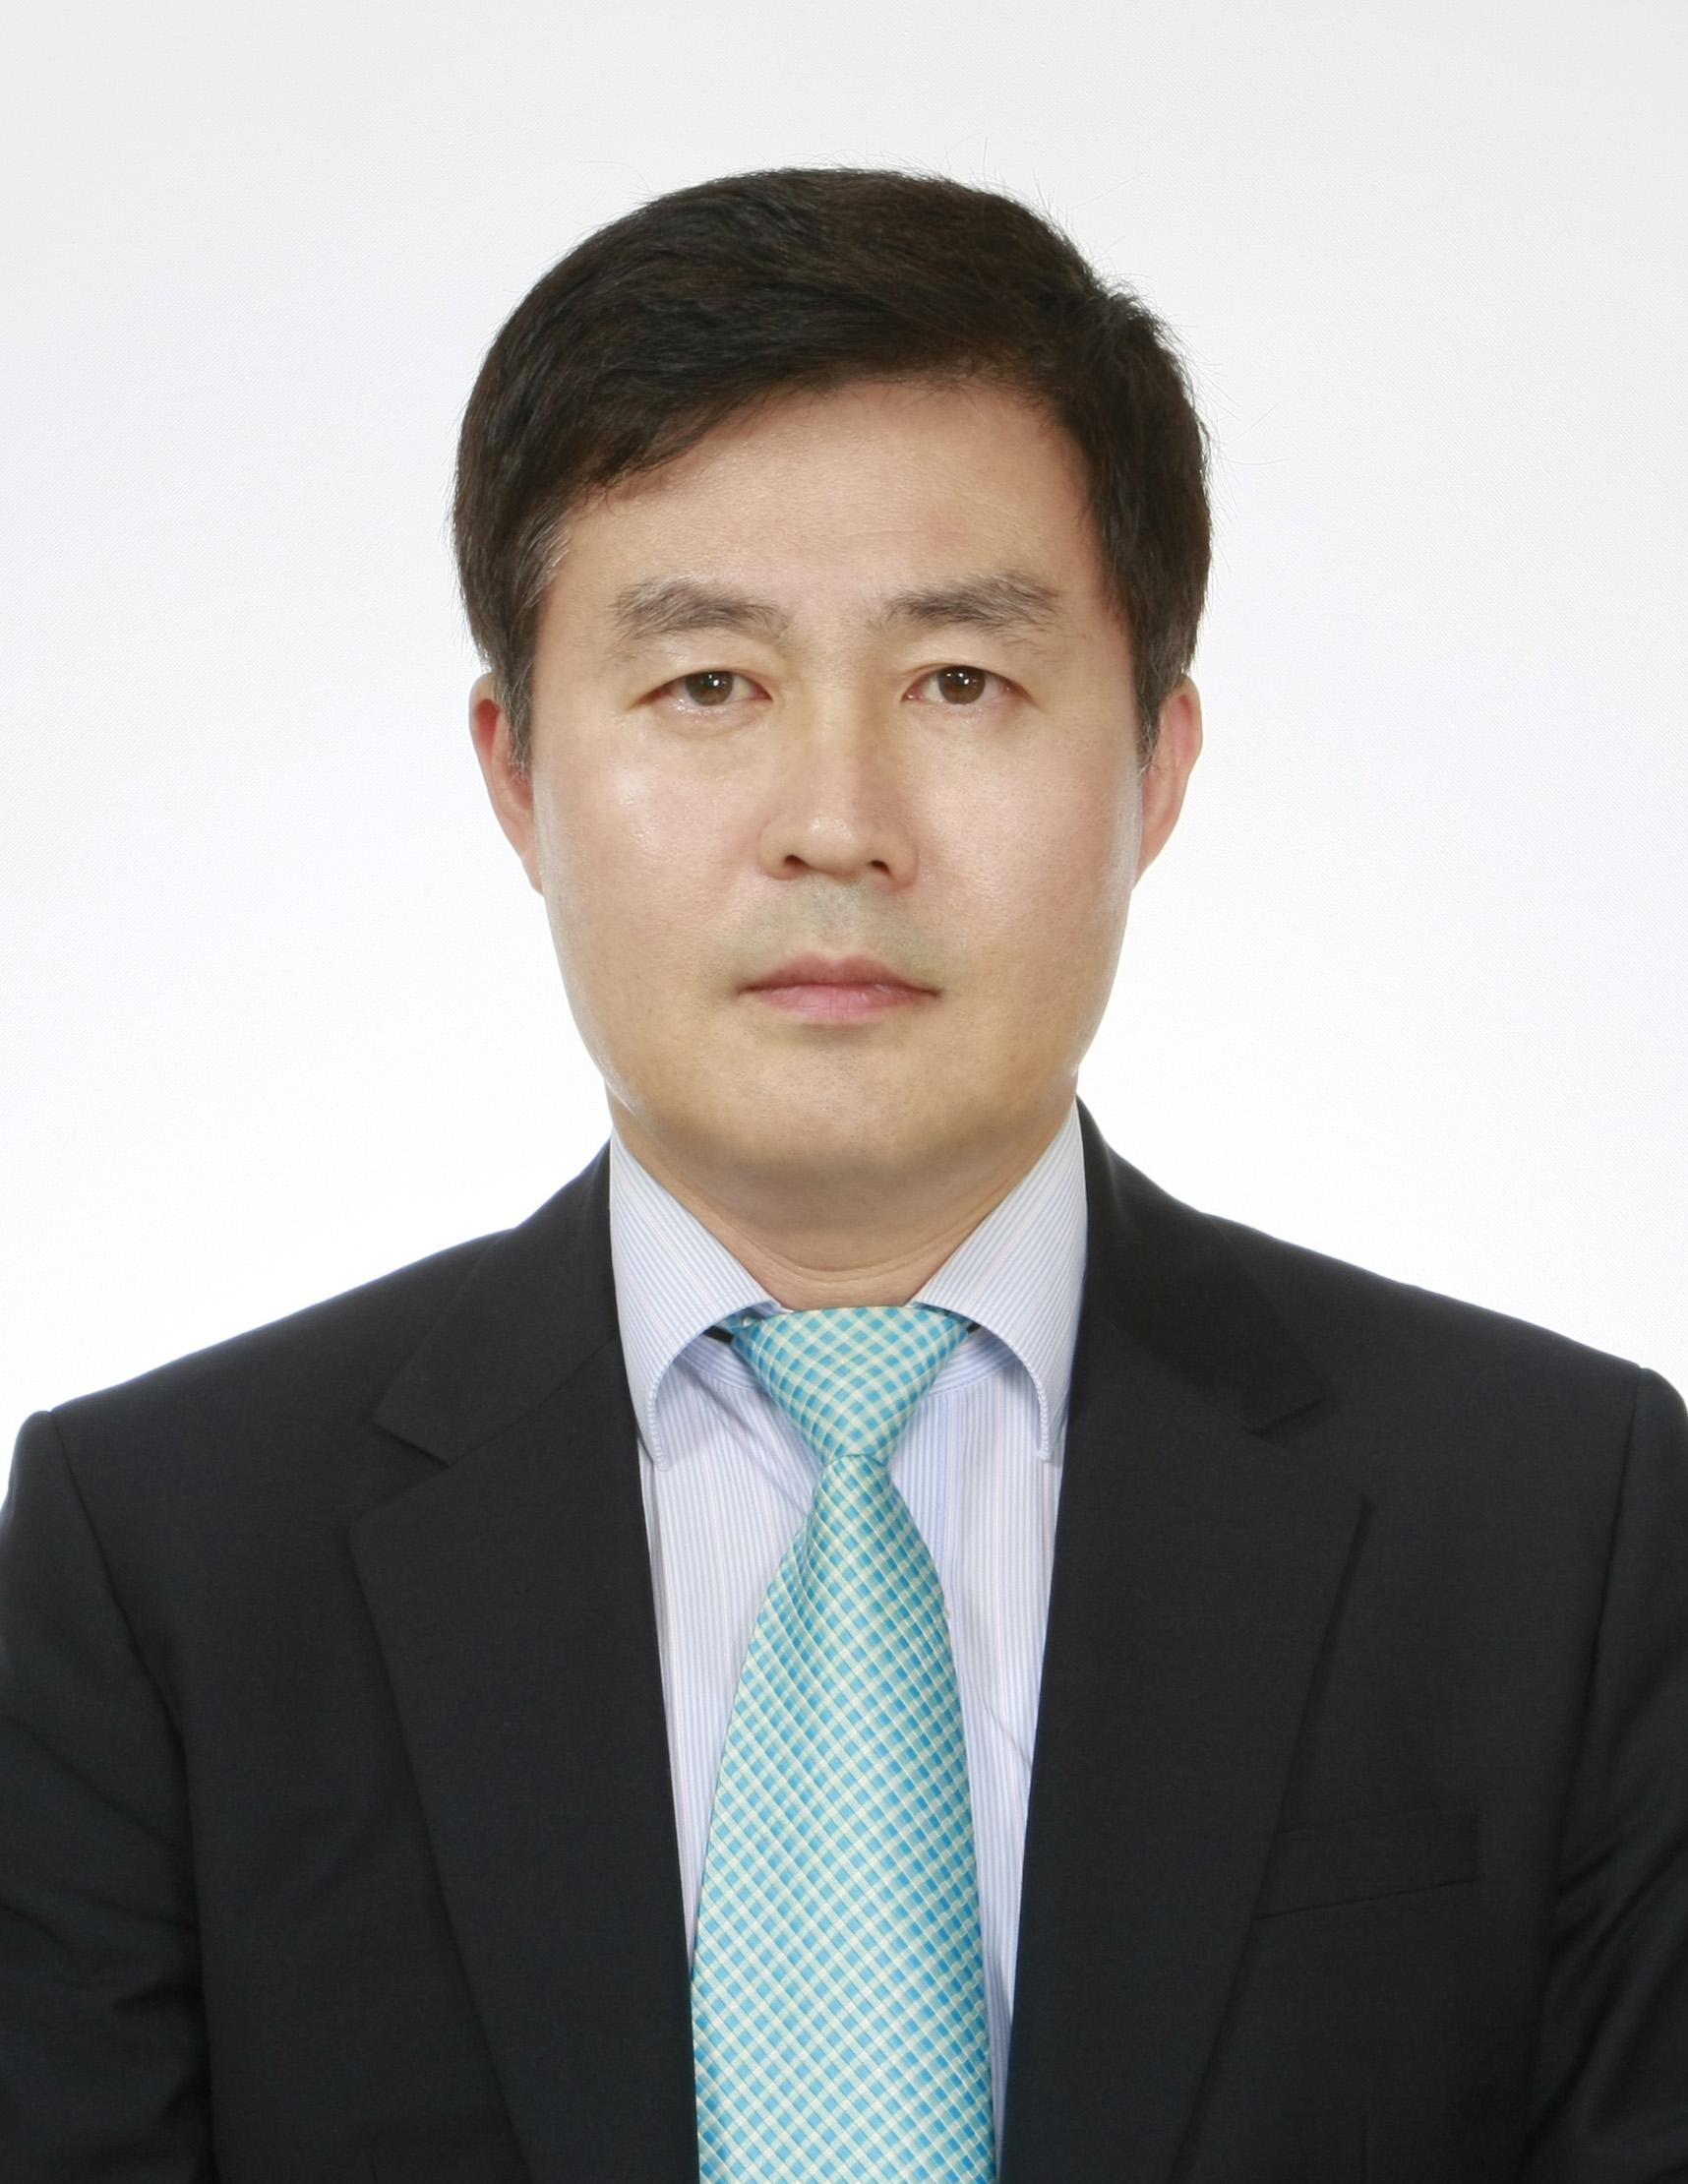 Kwon Hee-seog